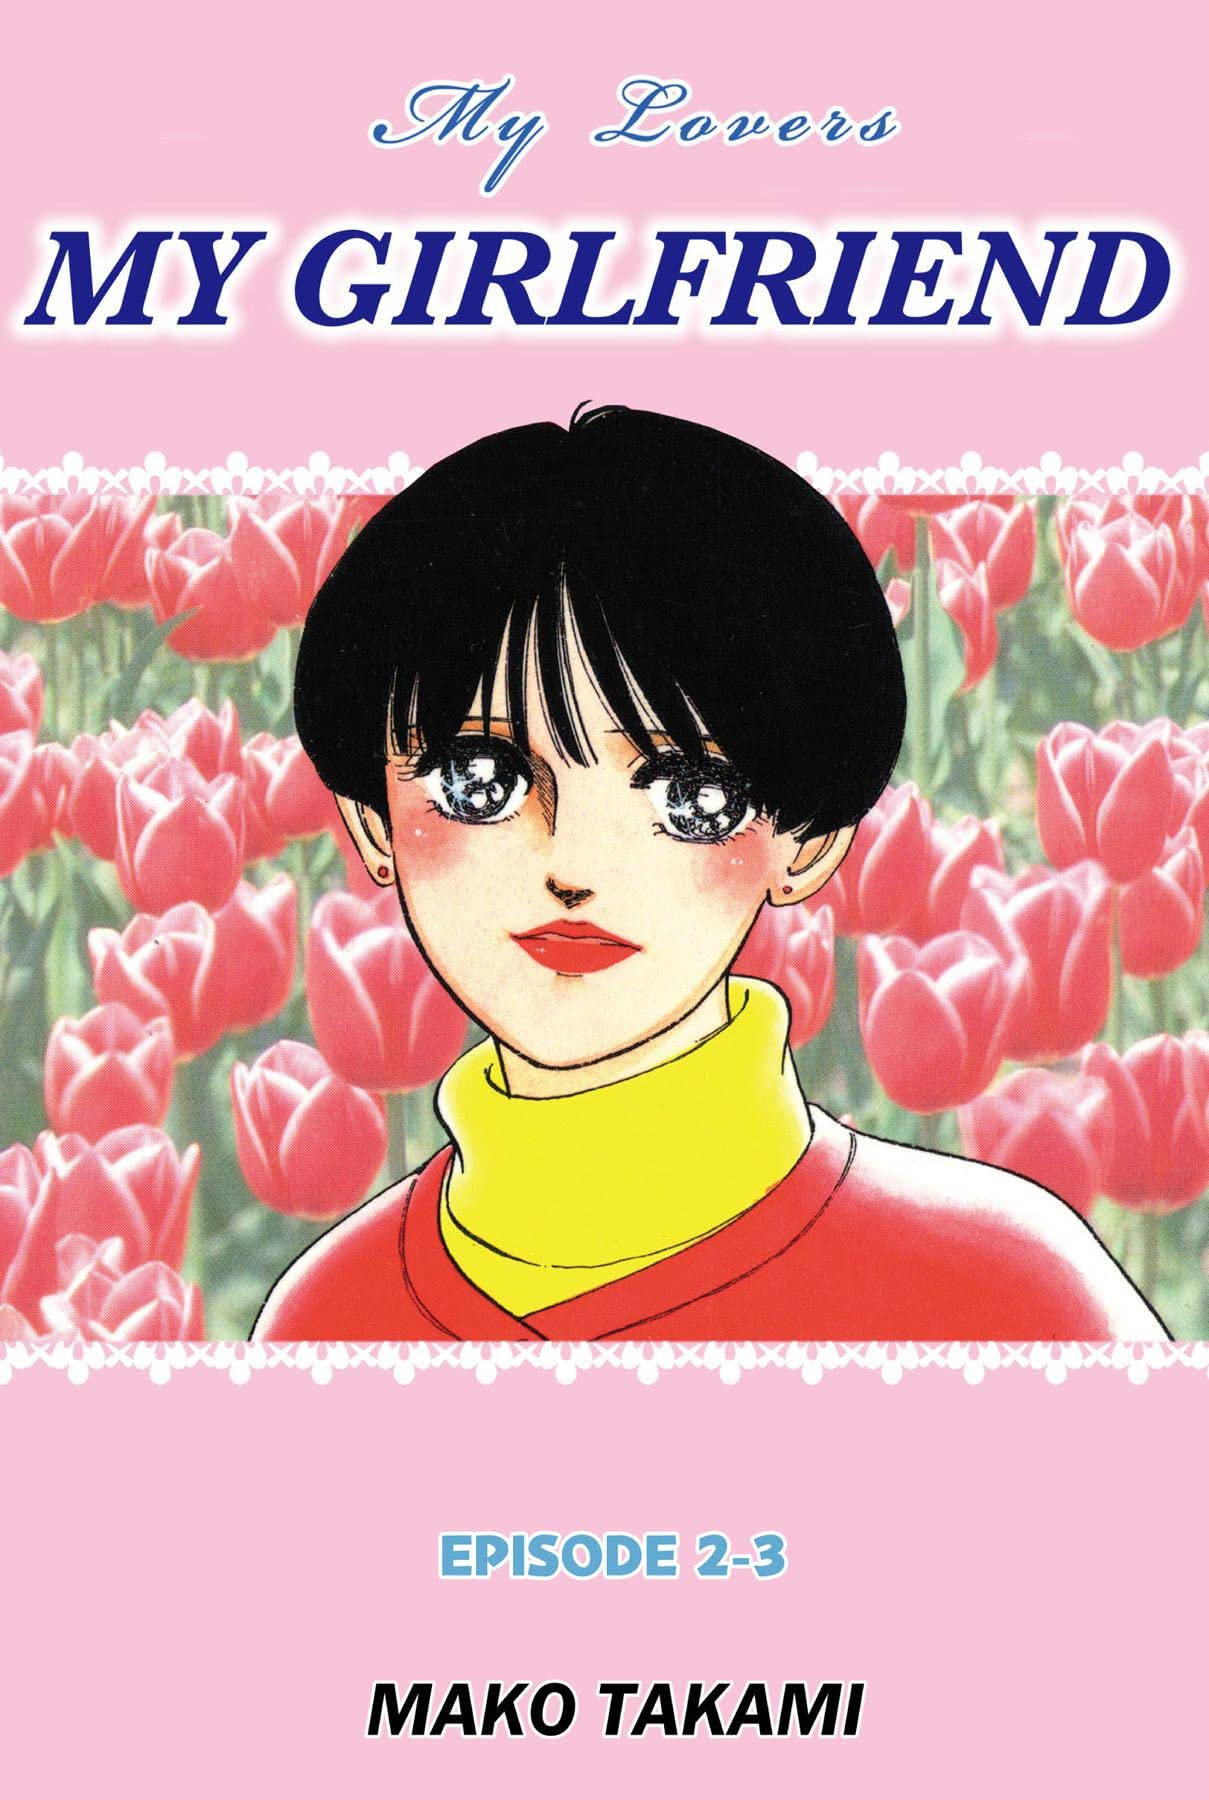 MY GIRLFRIEND #10